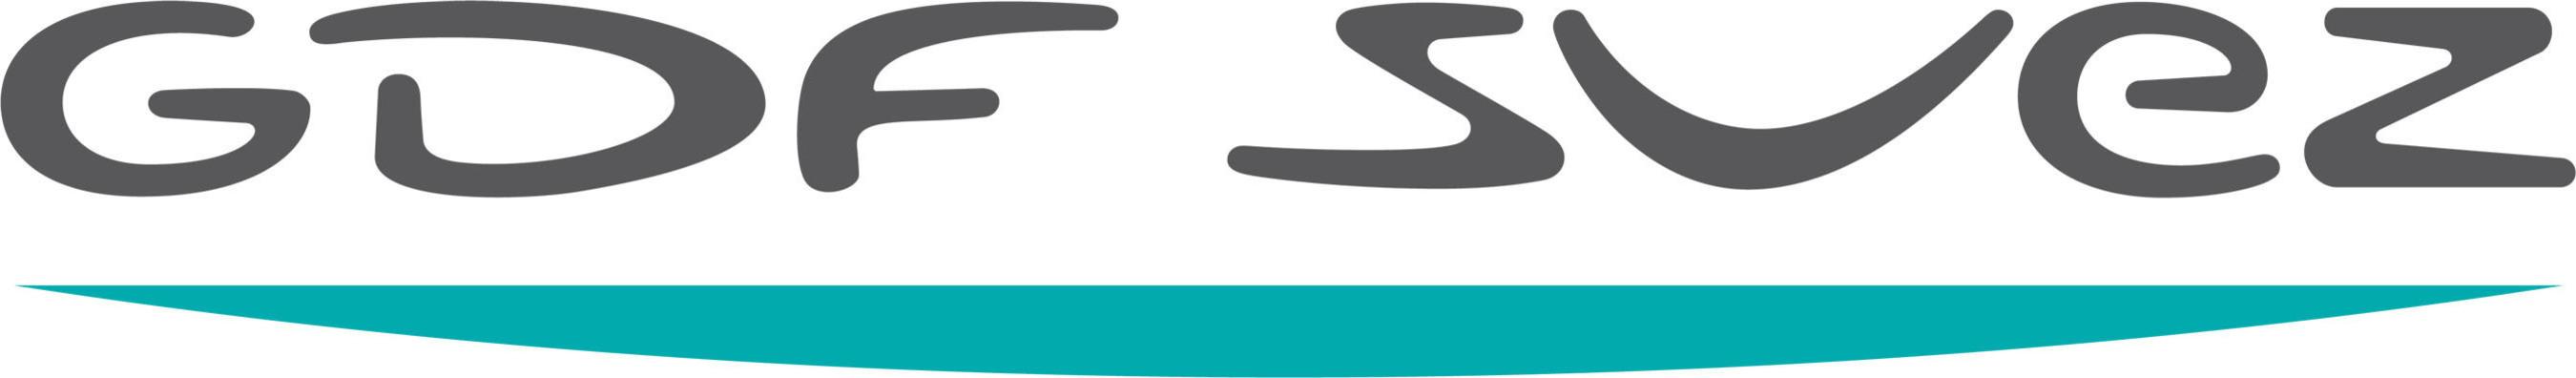 GDF SUEZ Energy Logo.